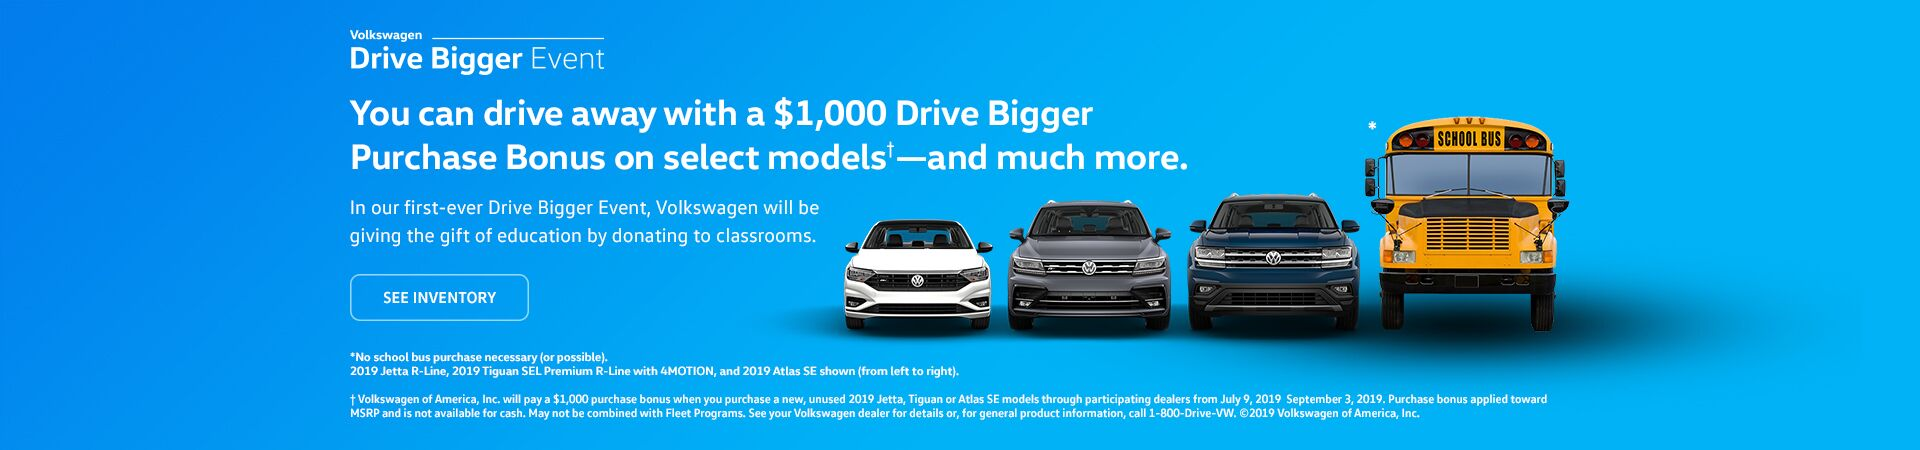 Volkswagen Dealership Santa Monica CA Pre-Owned Cars Volkswagen